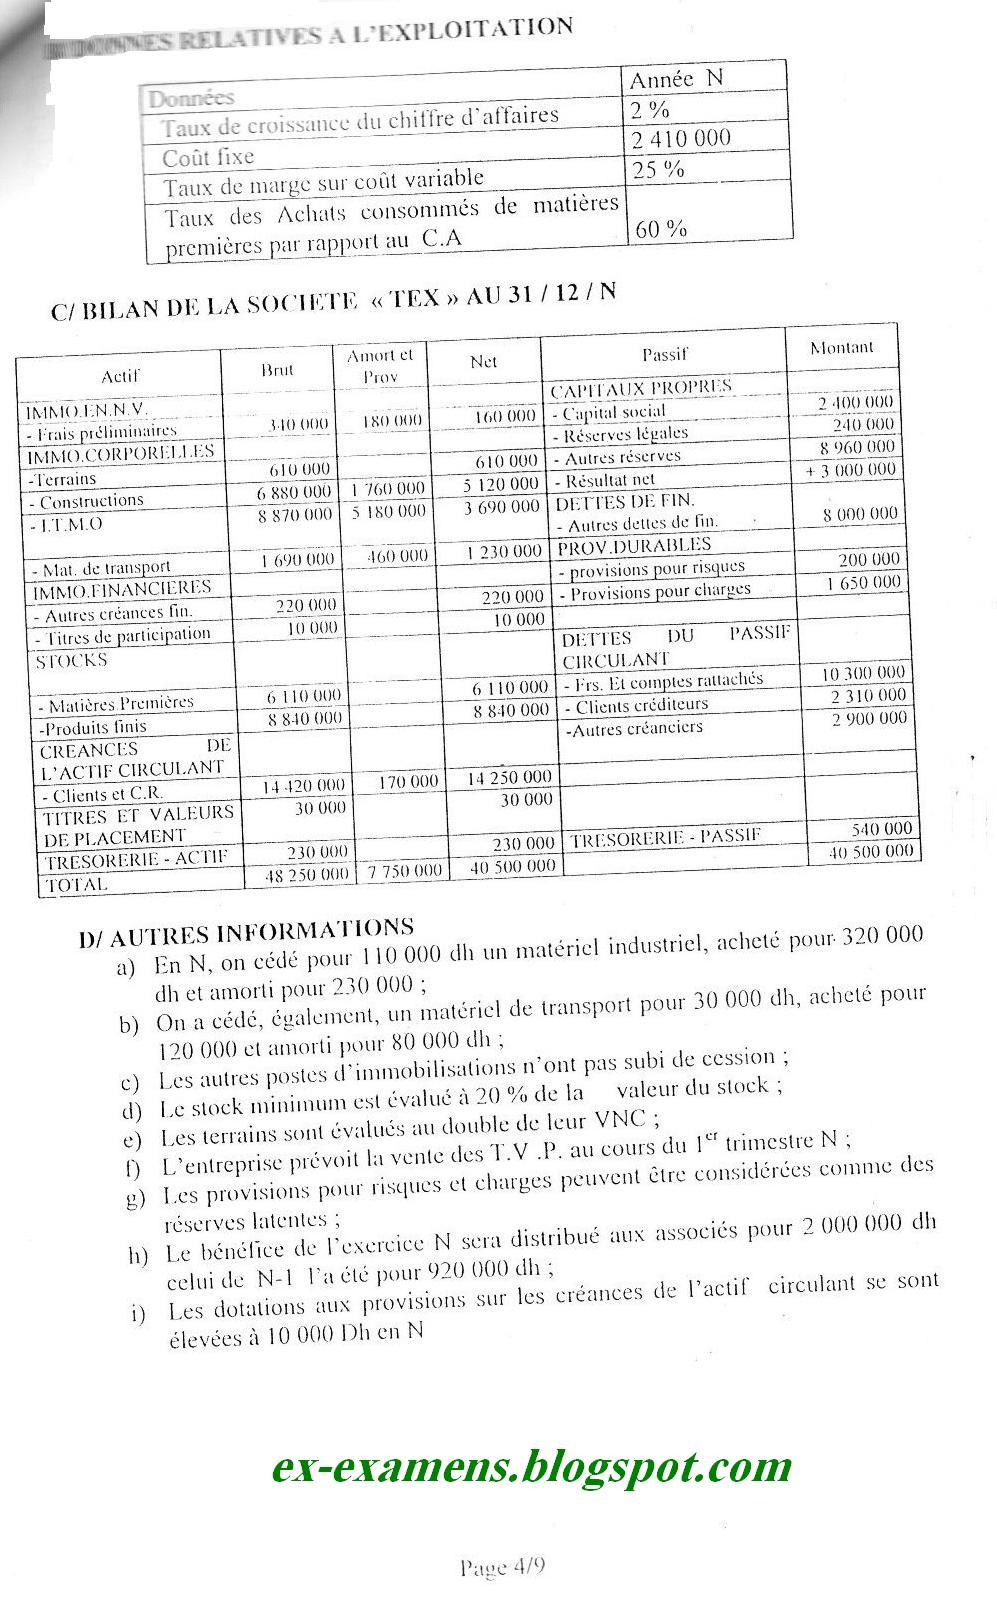 Examen de fin de formation pratique TSGE 2006 Variante 2 IMG_0123